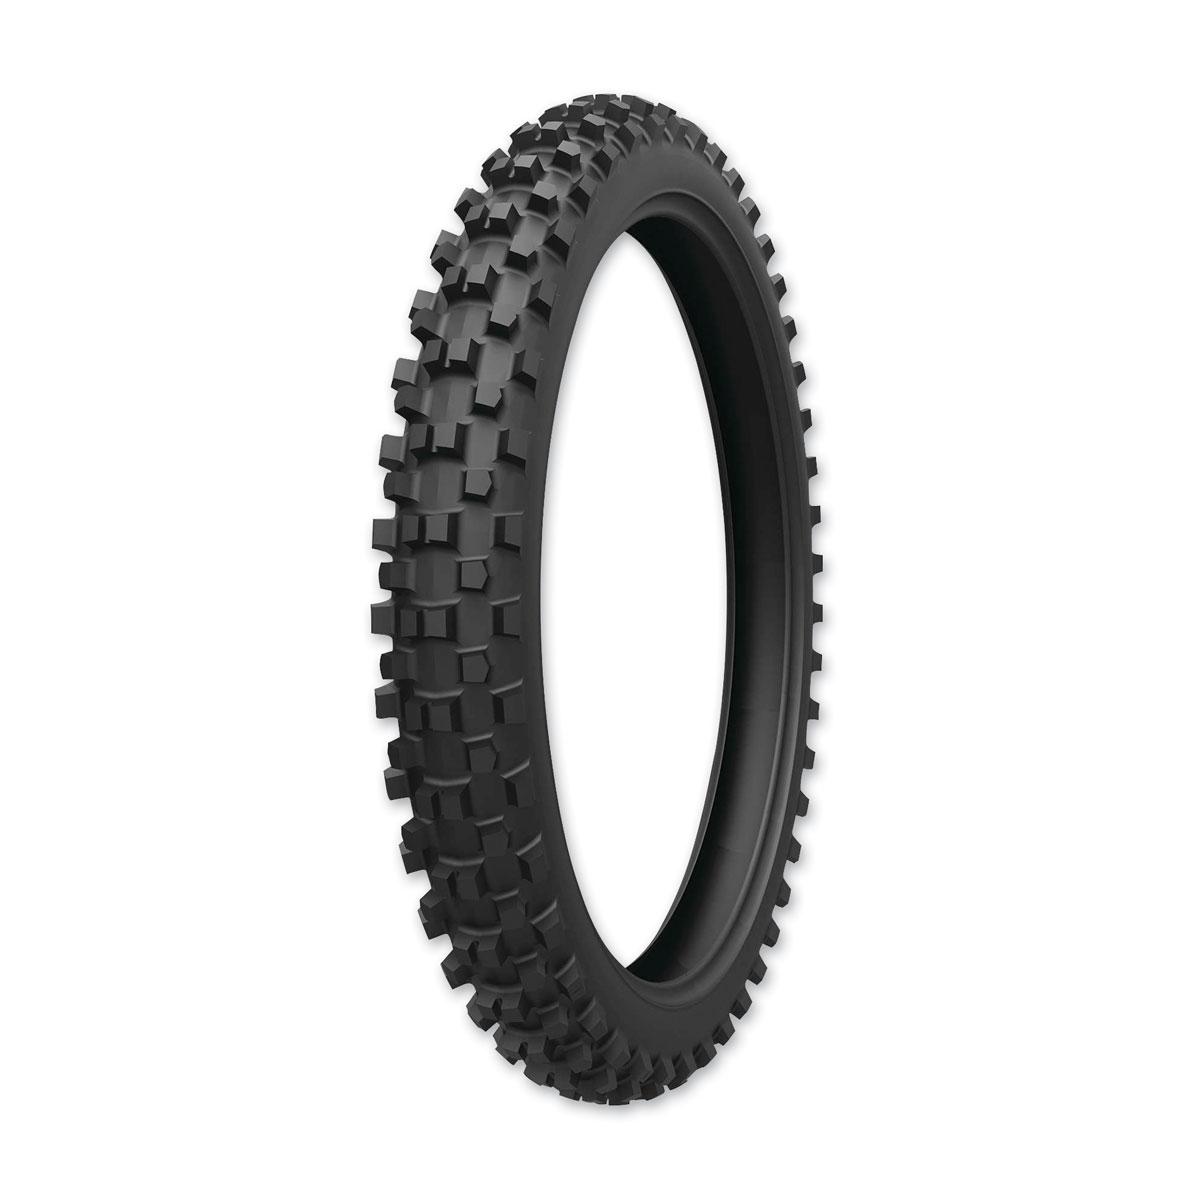 Kenda Tires Washougal II 70/100-19 Front Tire